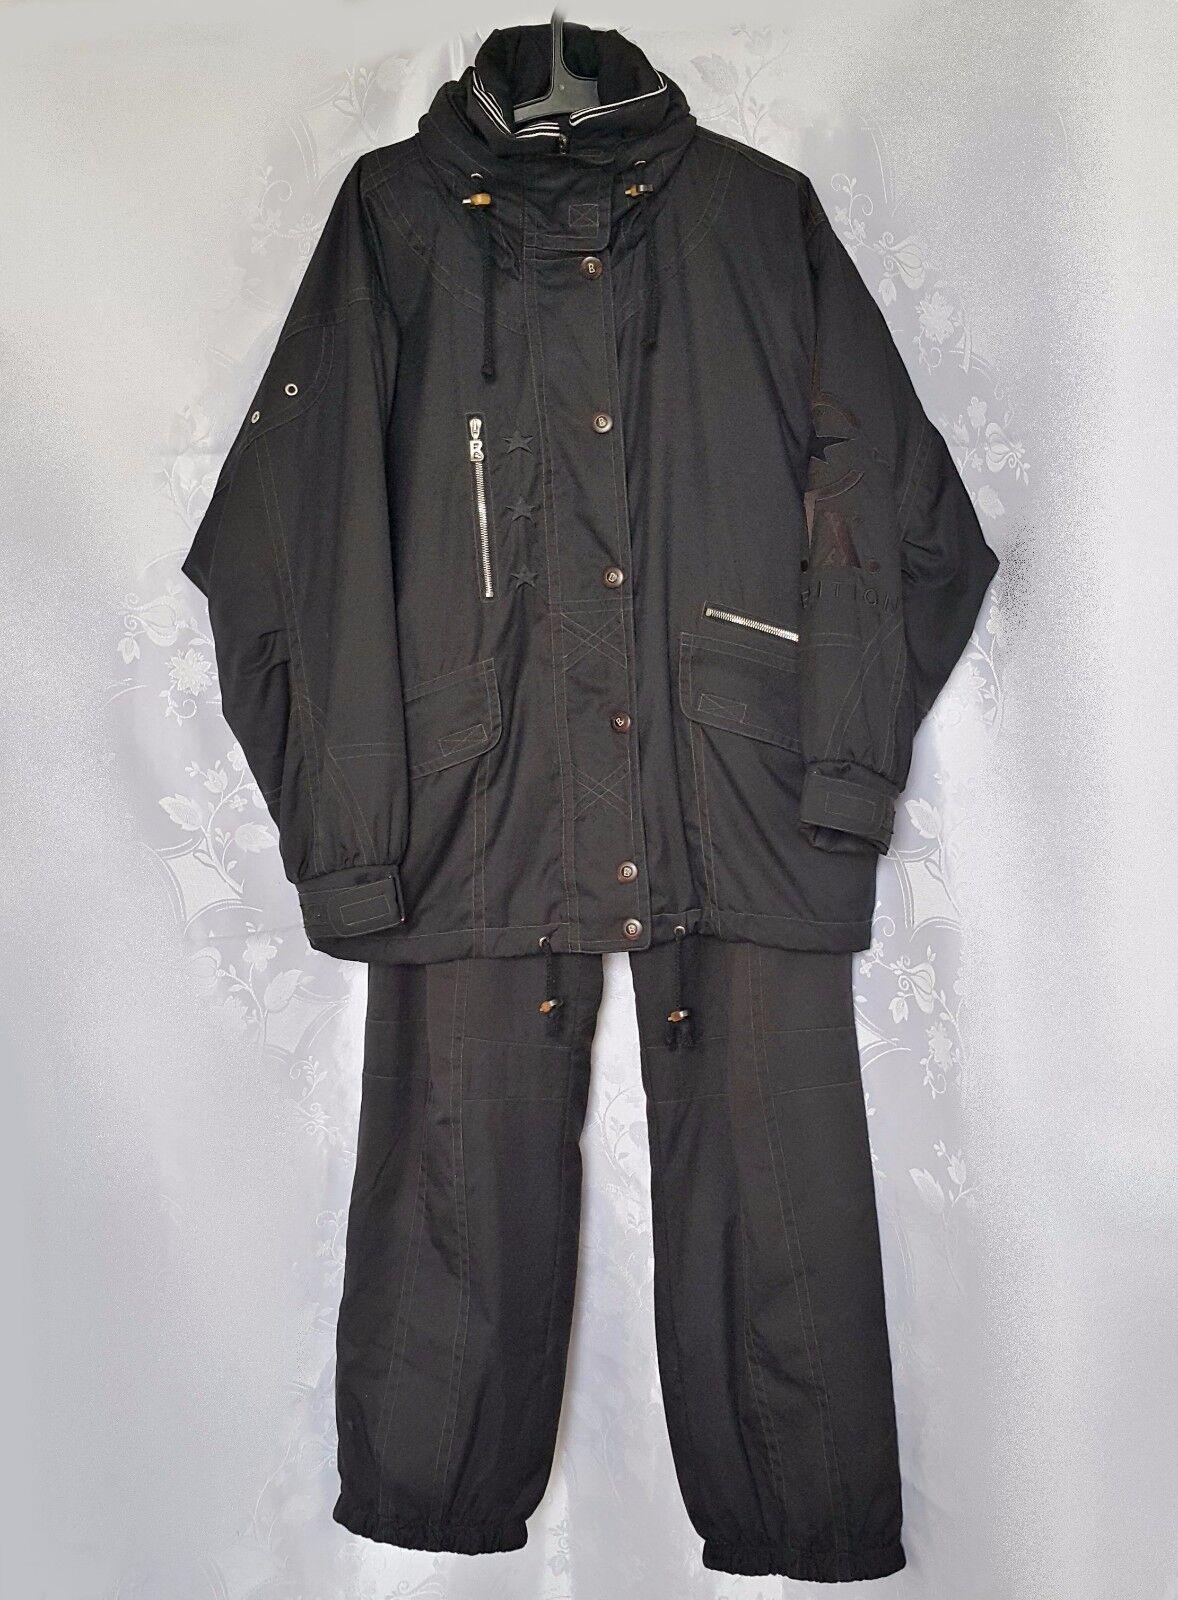 AUTHENTIC BOGNER ZIPPED WITH HOOD WOMENS PANTS SNOW SUIT SIZE US10 EU38